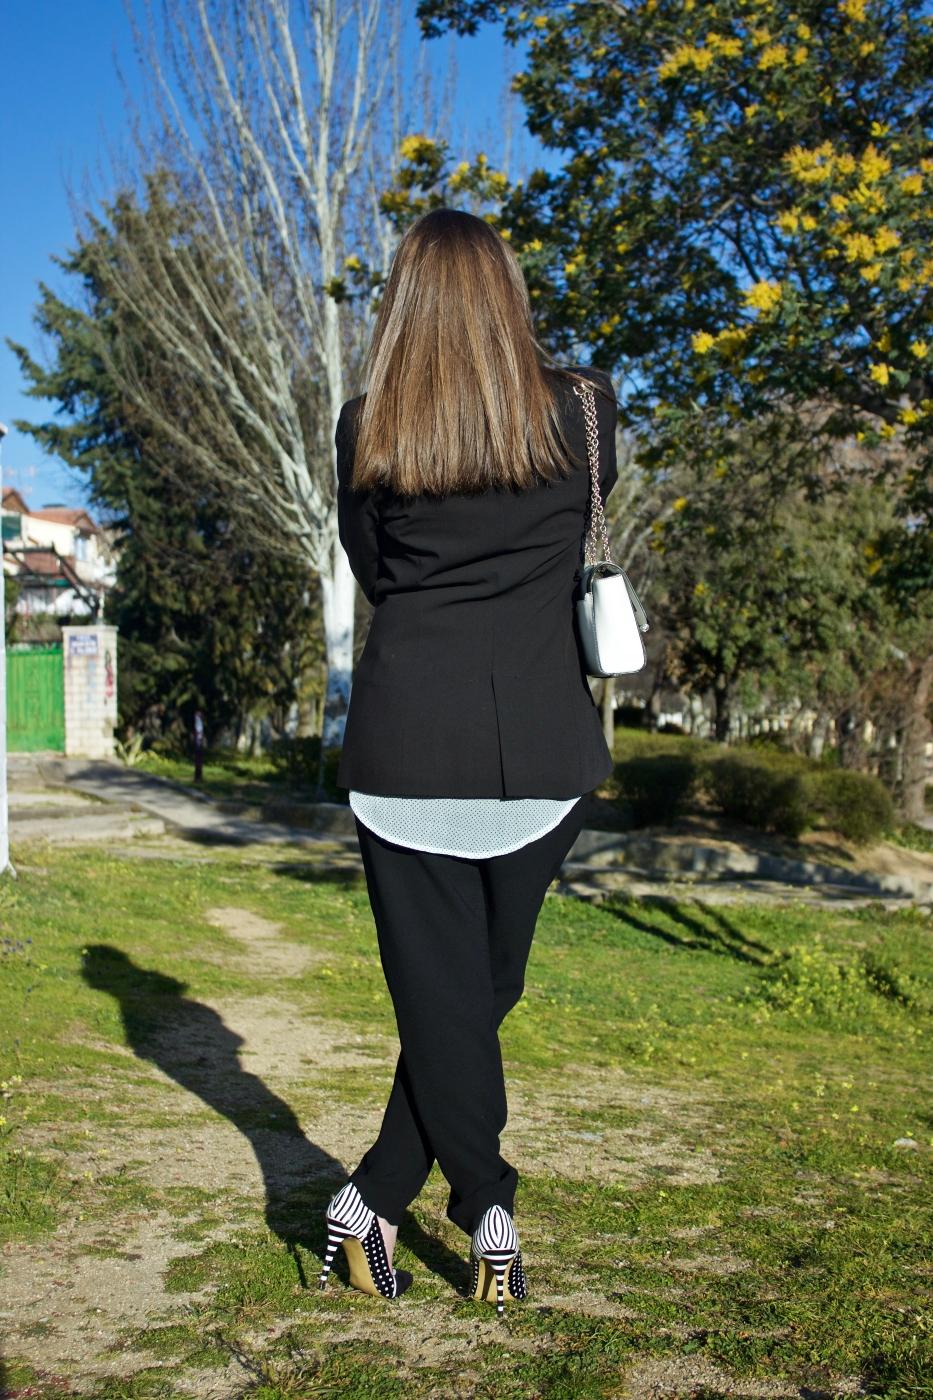 lara-vazquez-madlula-style-streetstyle-ootd-chic-look